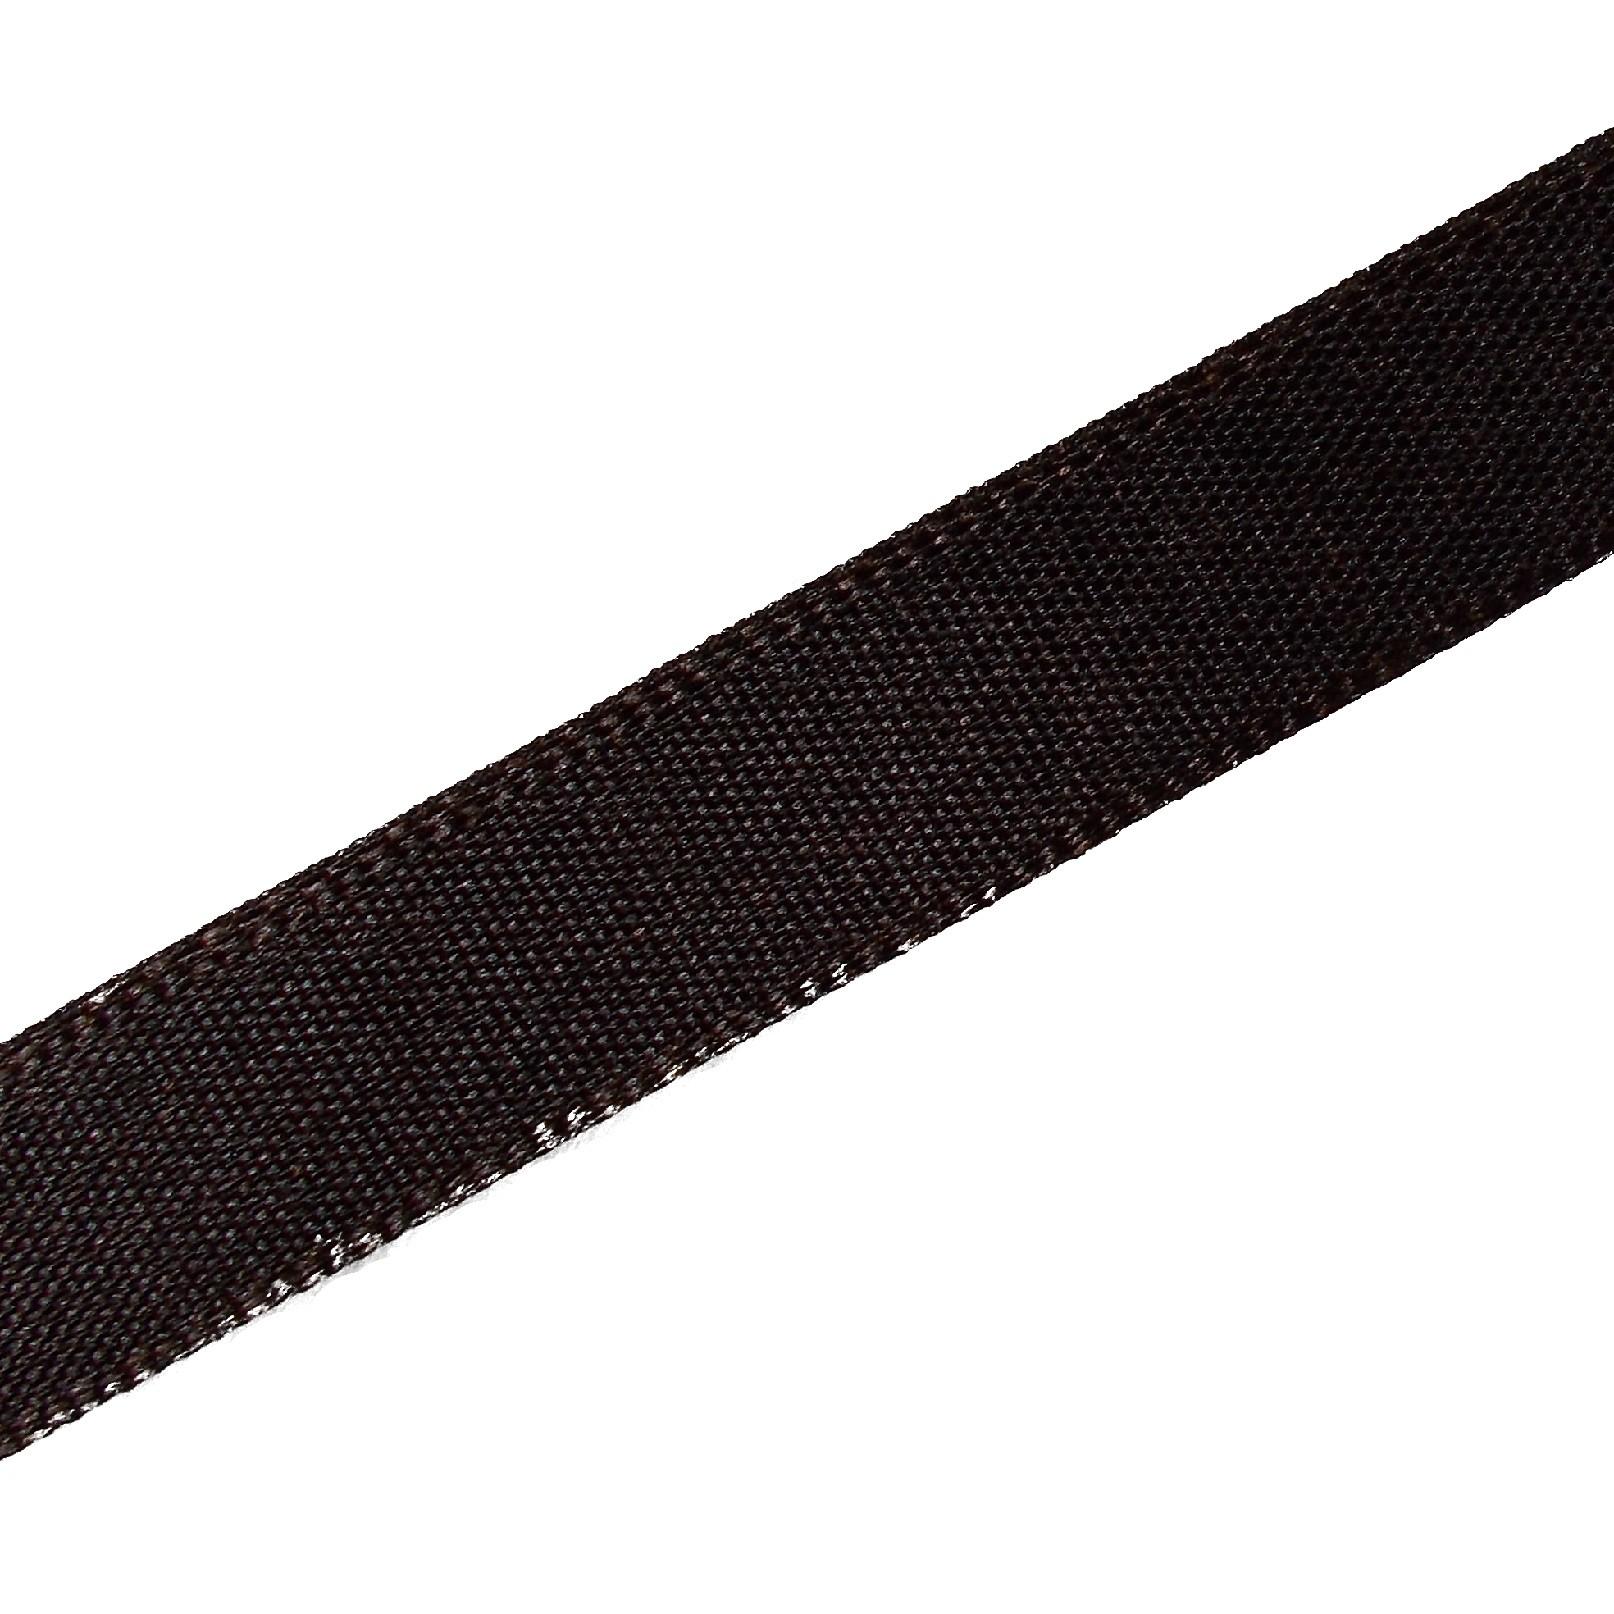 Berisfords Seam Binding Polyester Ribbon Tape 12mm wide Brown 2 metre length